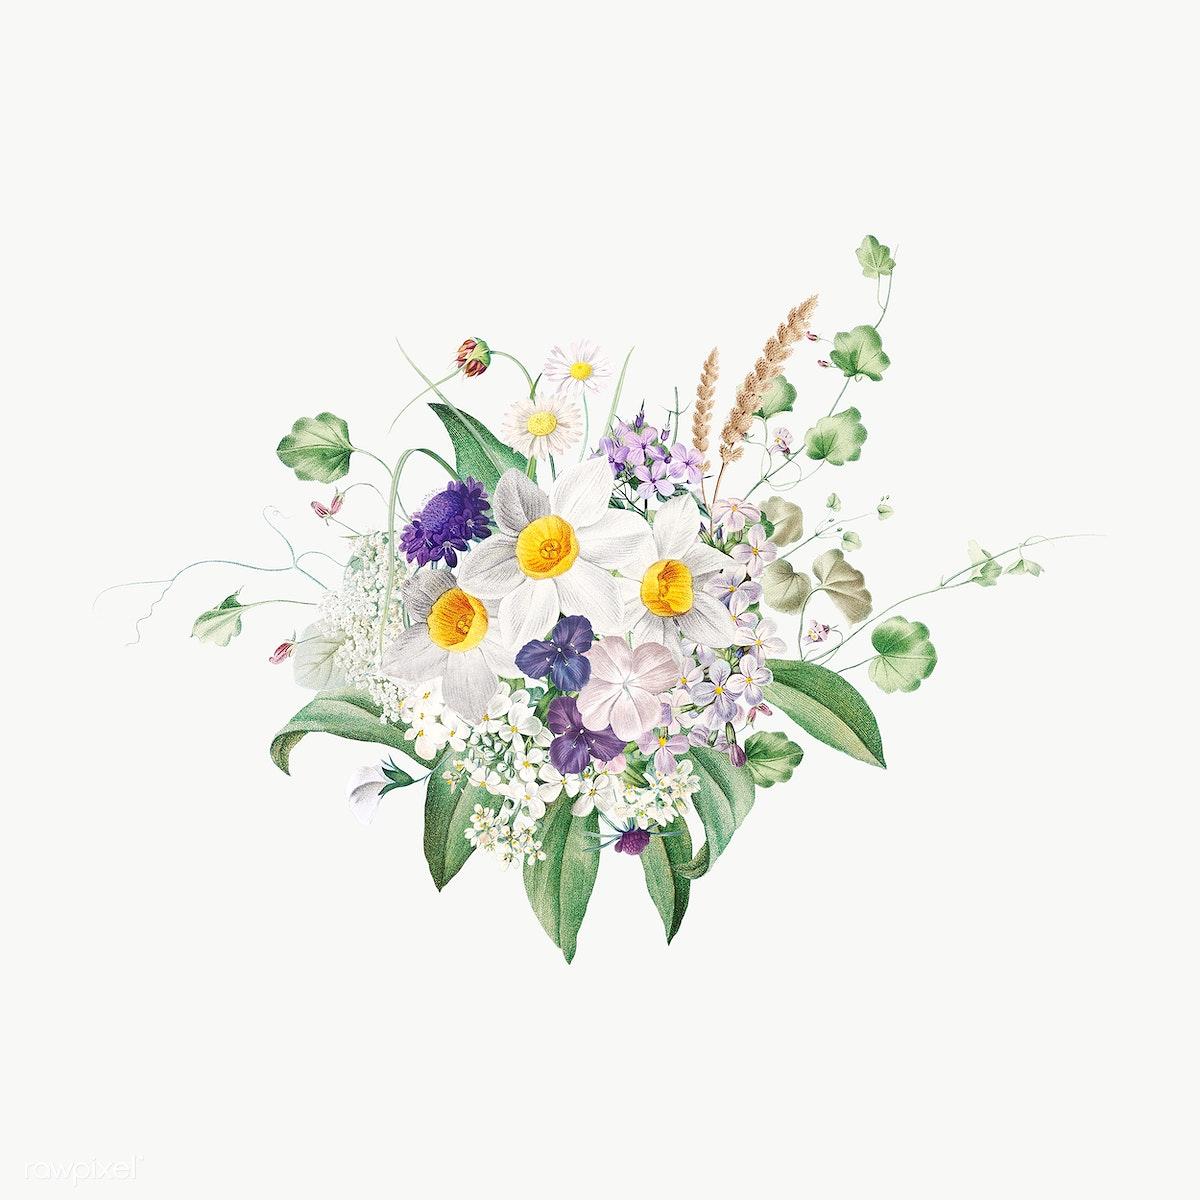 Summer Flowers Free Stock Illustration 573968